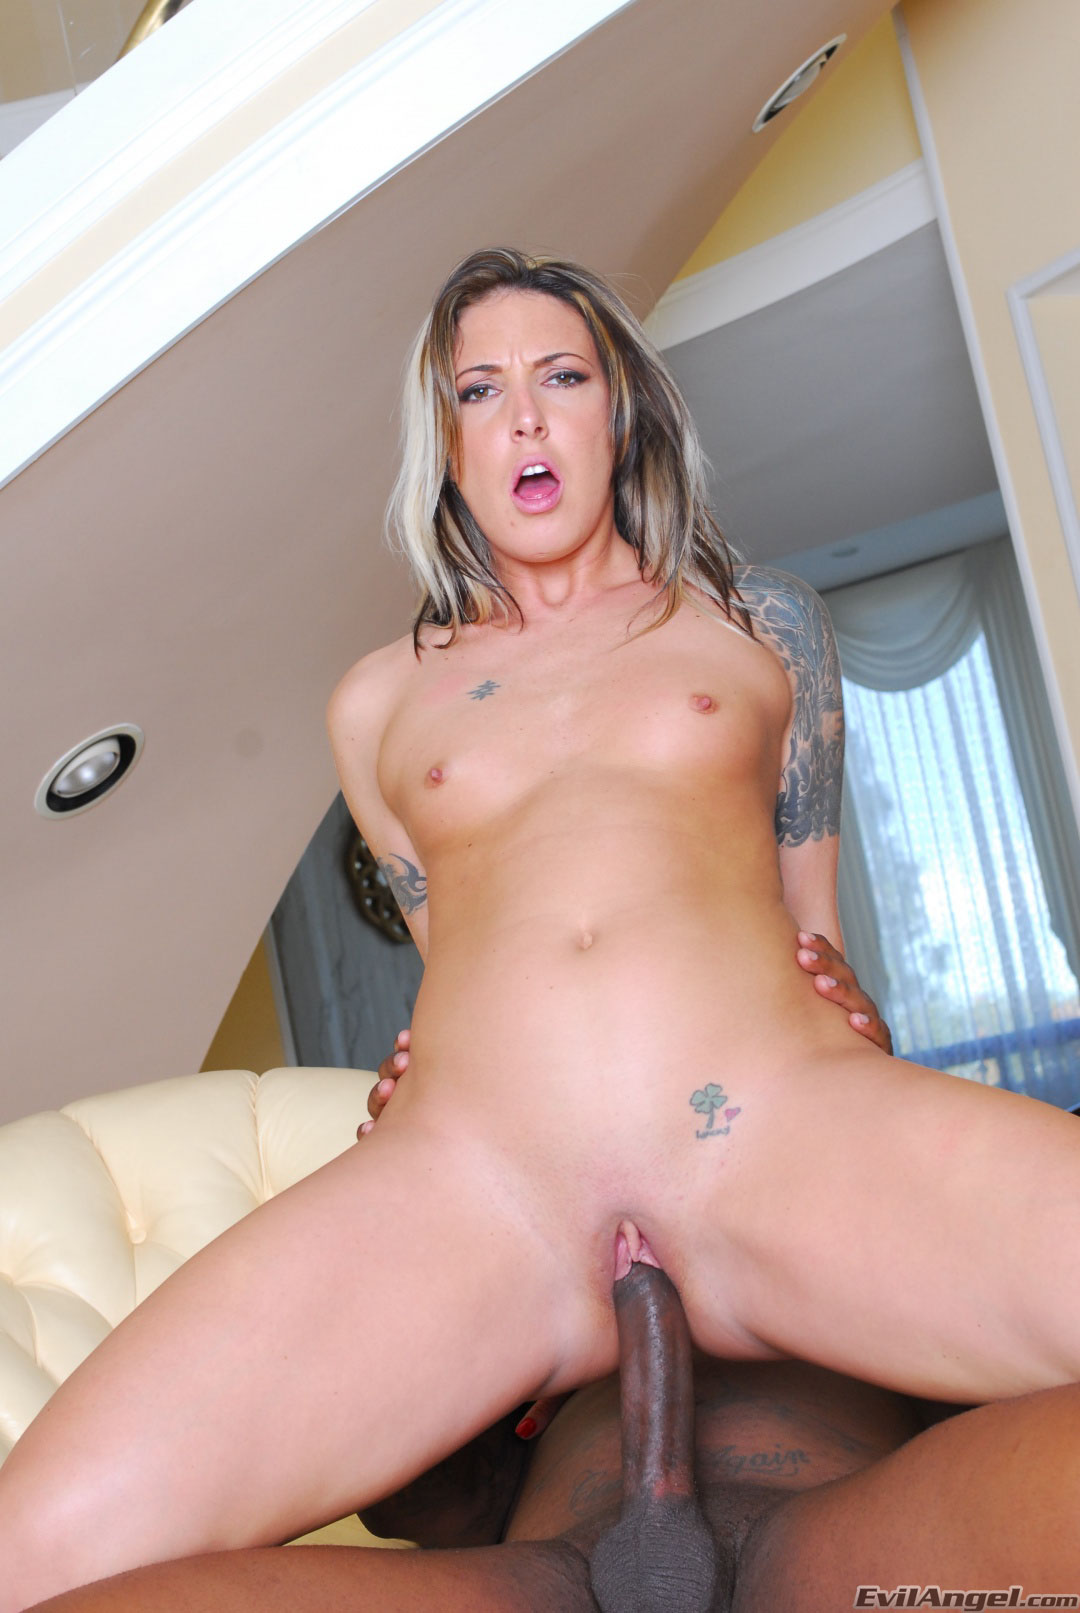 Fabulous pornstars fiona cheeks and christine sanders in hottest dildostoys, blonde XXX picture porn photo